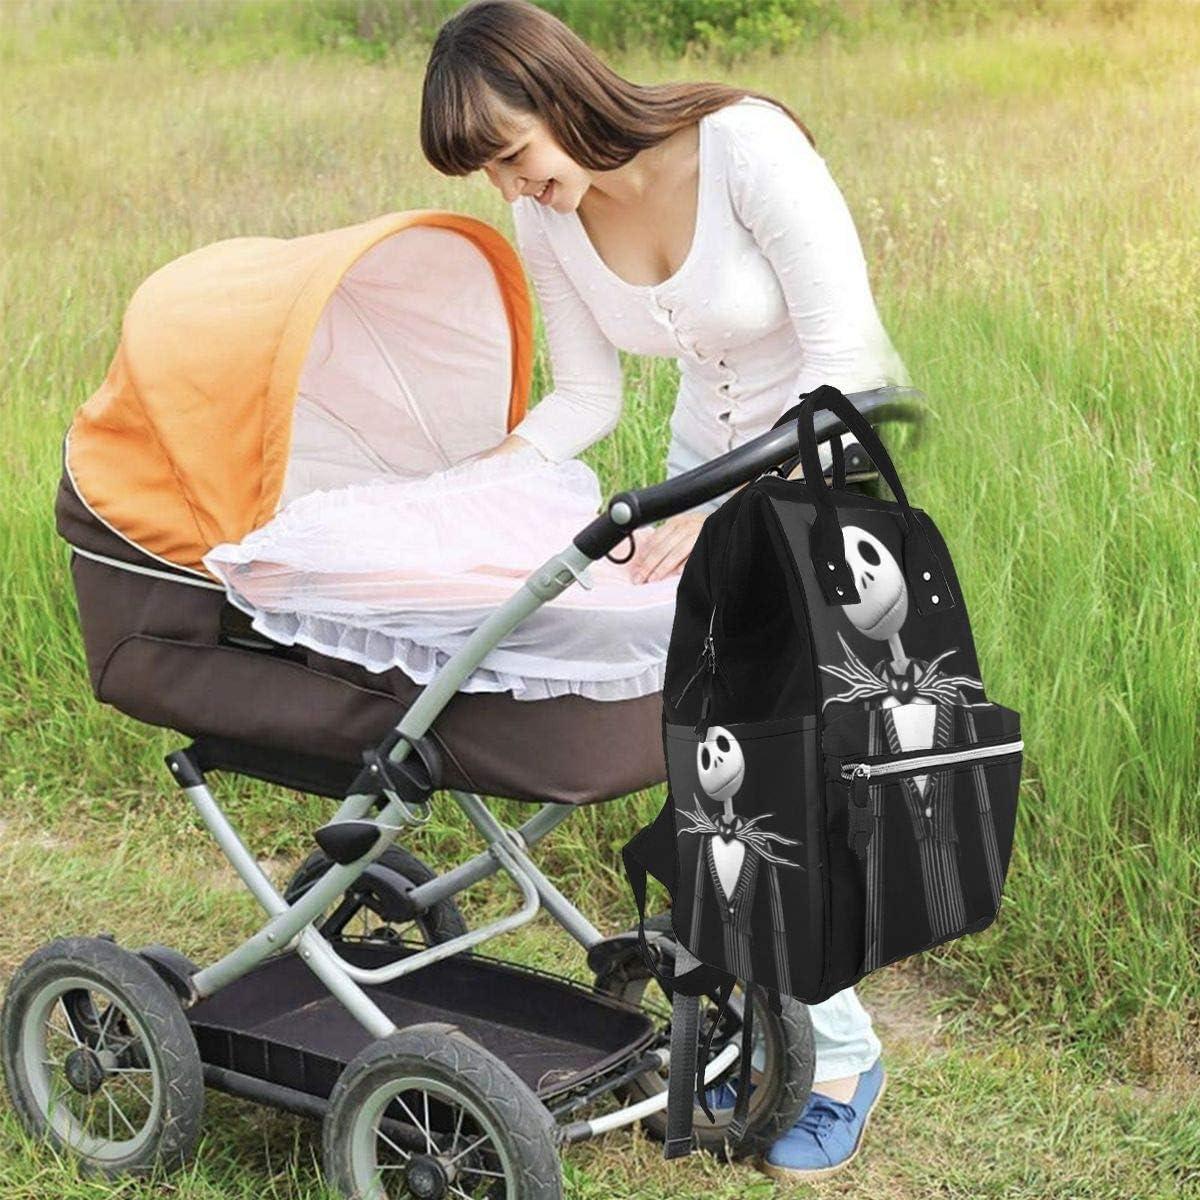 Jack Skellington Mochila de Viaje Impermeable multifunci/ón Bolsas para Cambiar pa/ñales para beb/és de Maternidad Mochila para pa/ñales